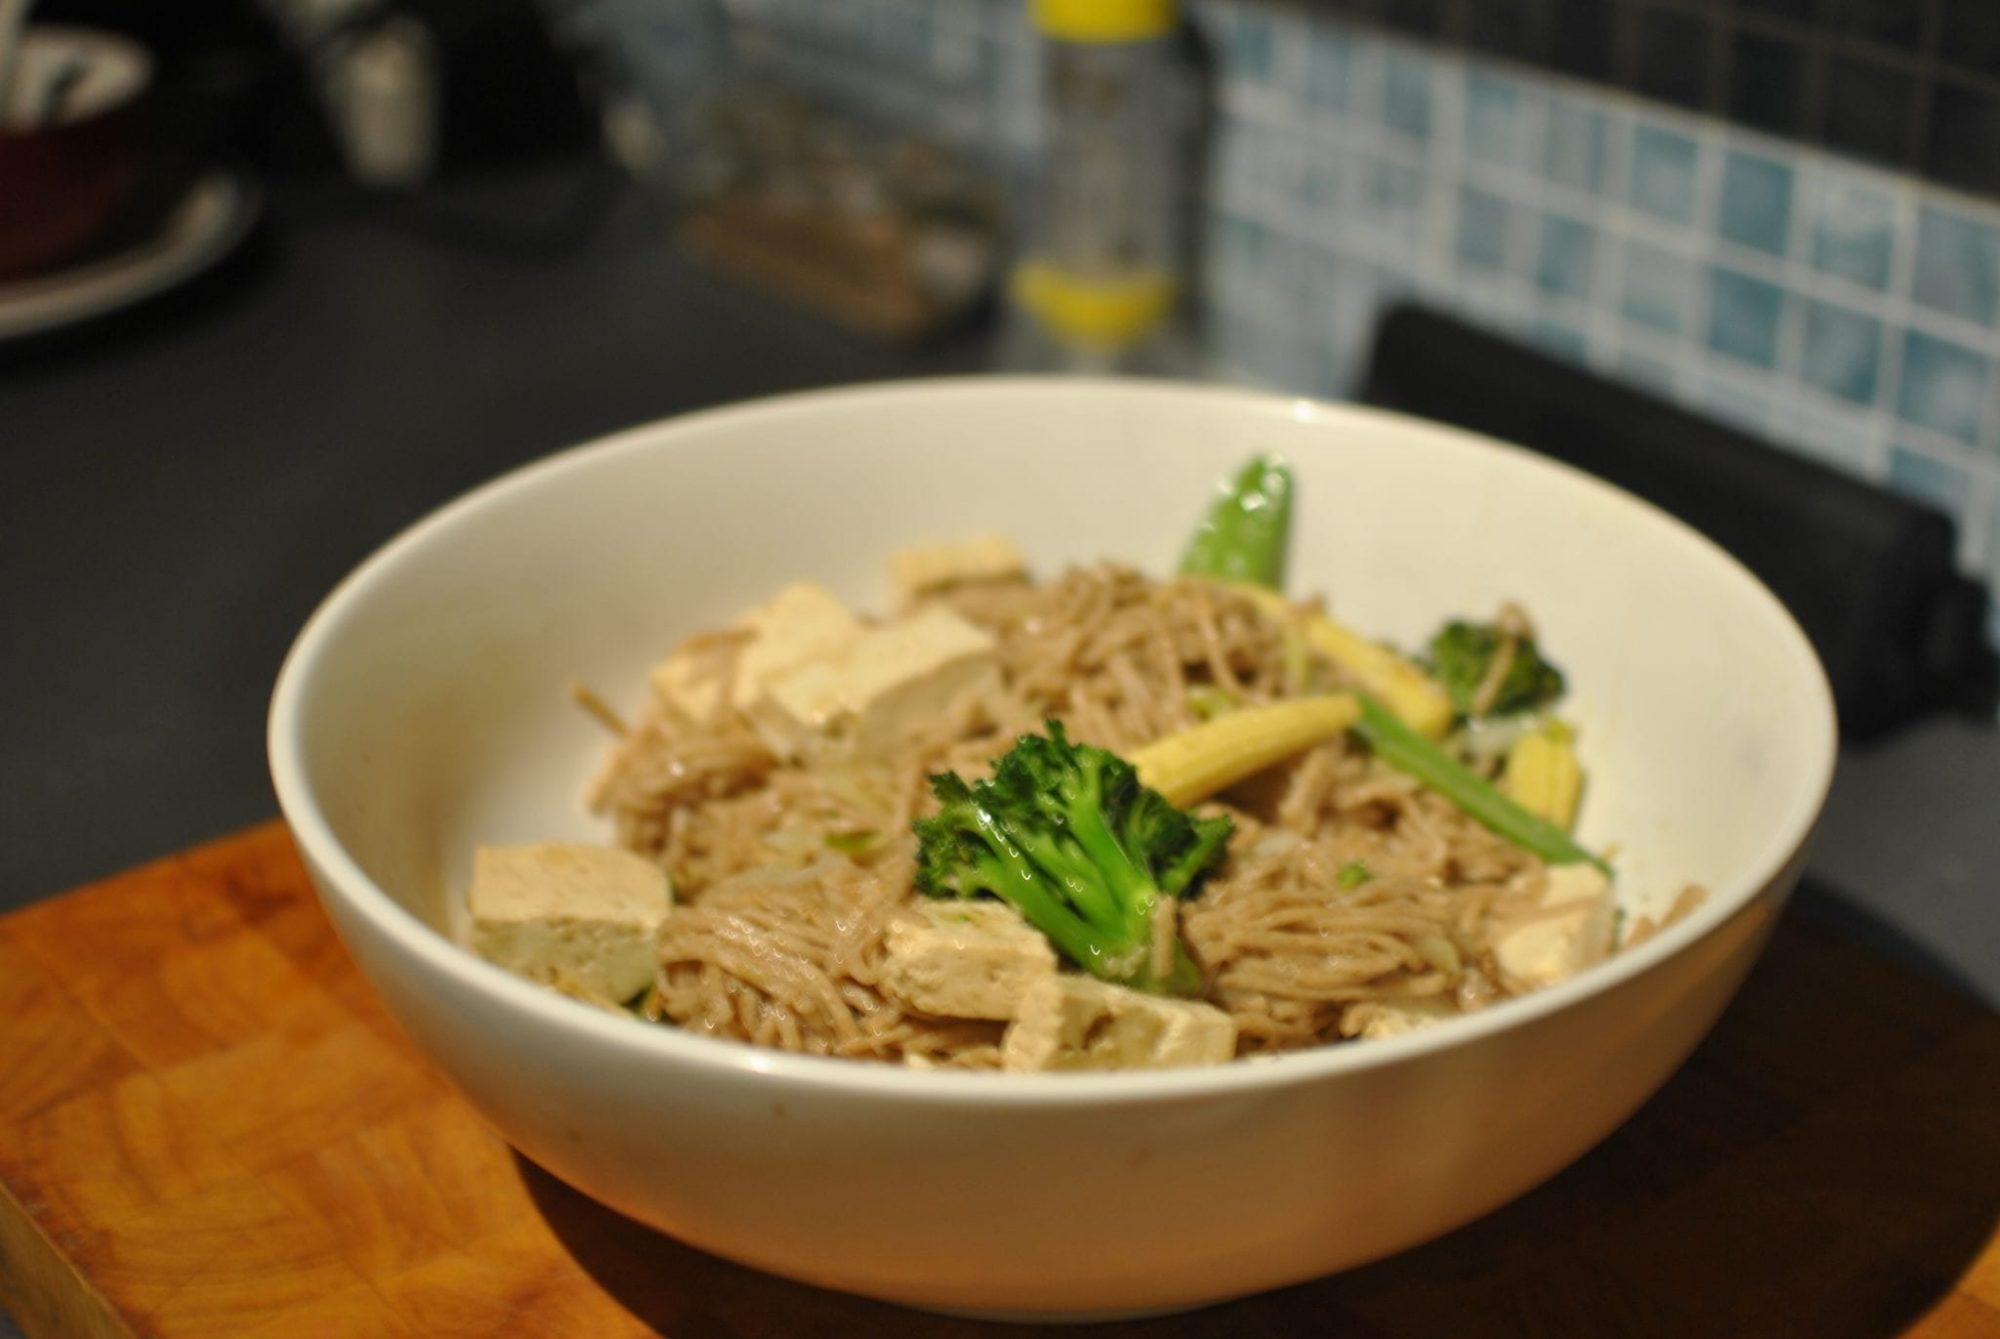 bowl of tofu noodles